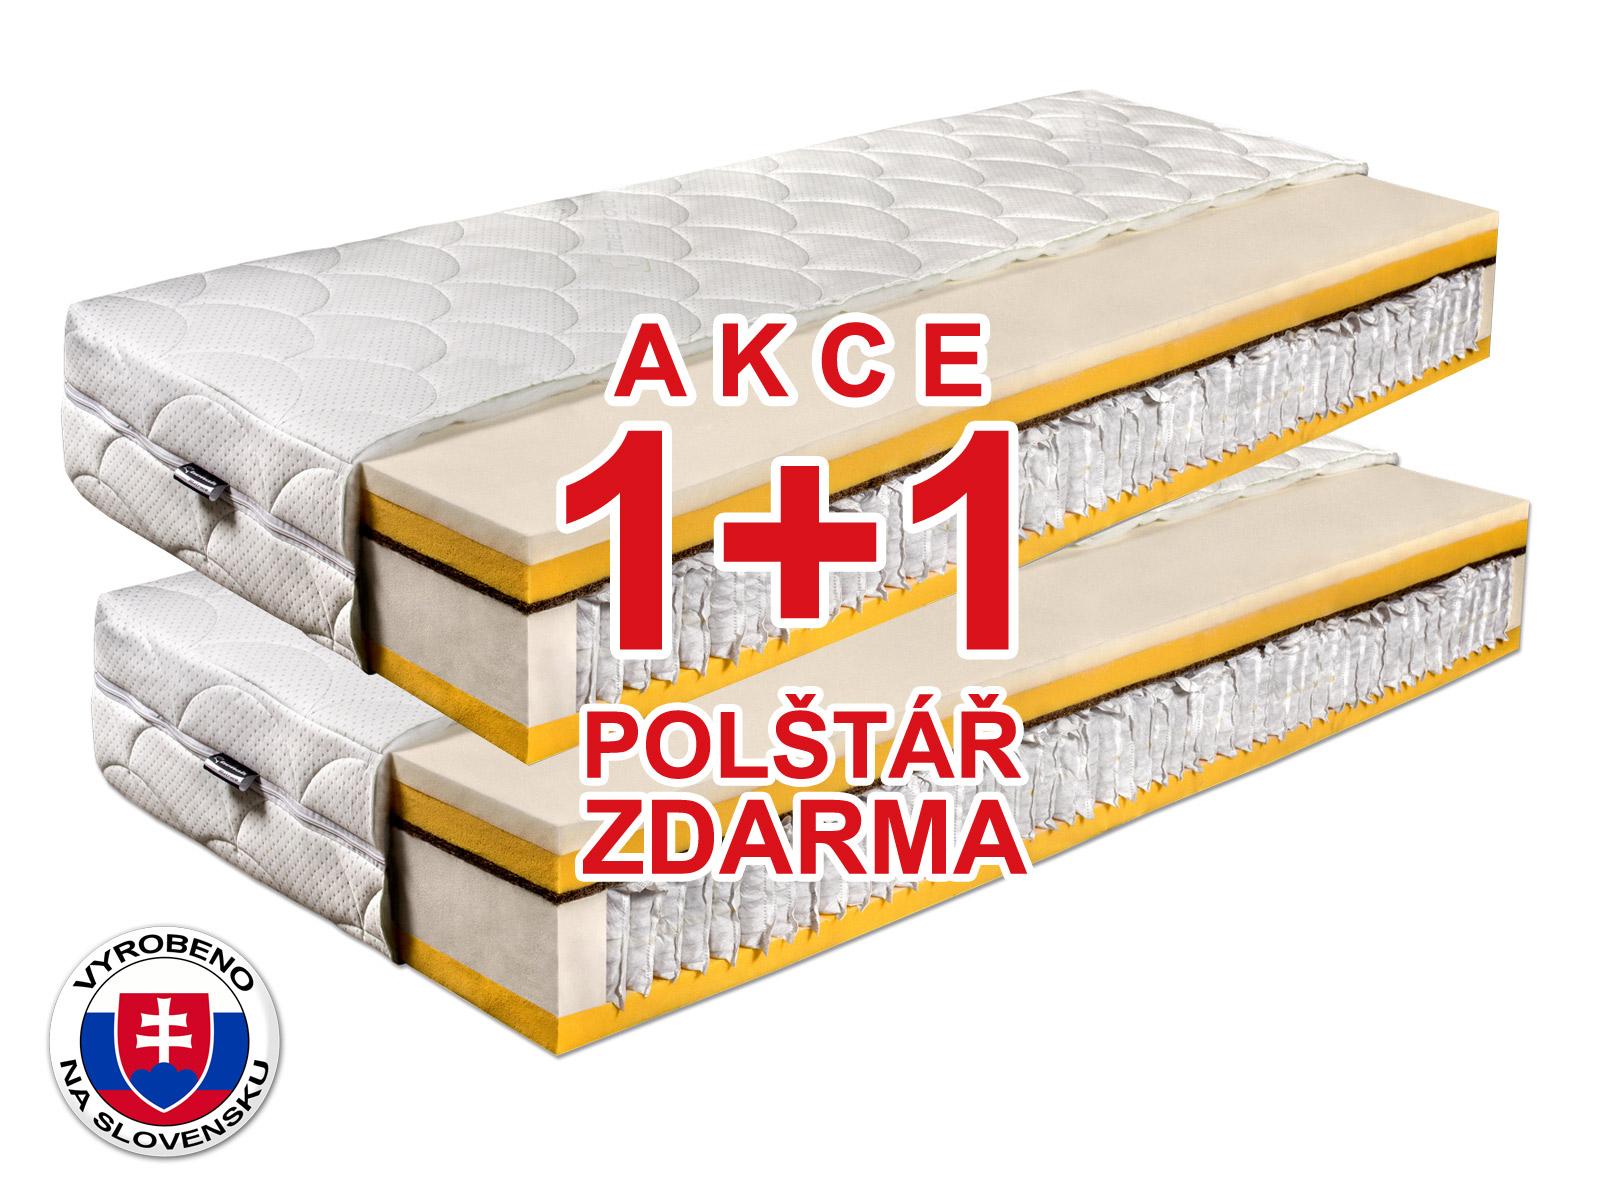 Taštičková matrace - Benab - Benab Five Star - 200x80 cm (T3/T4) *AKCE 1+1